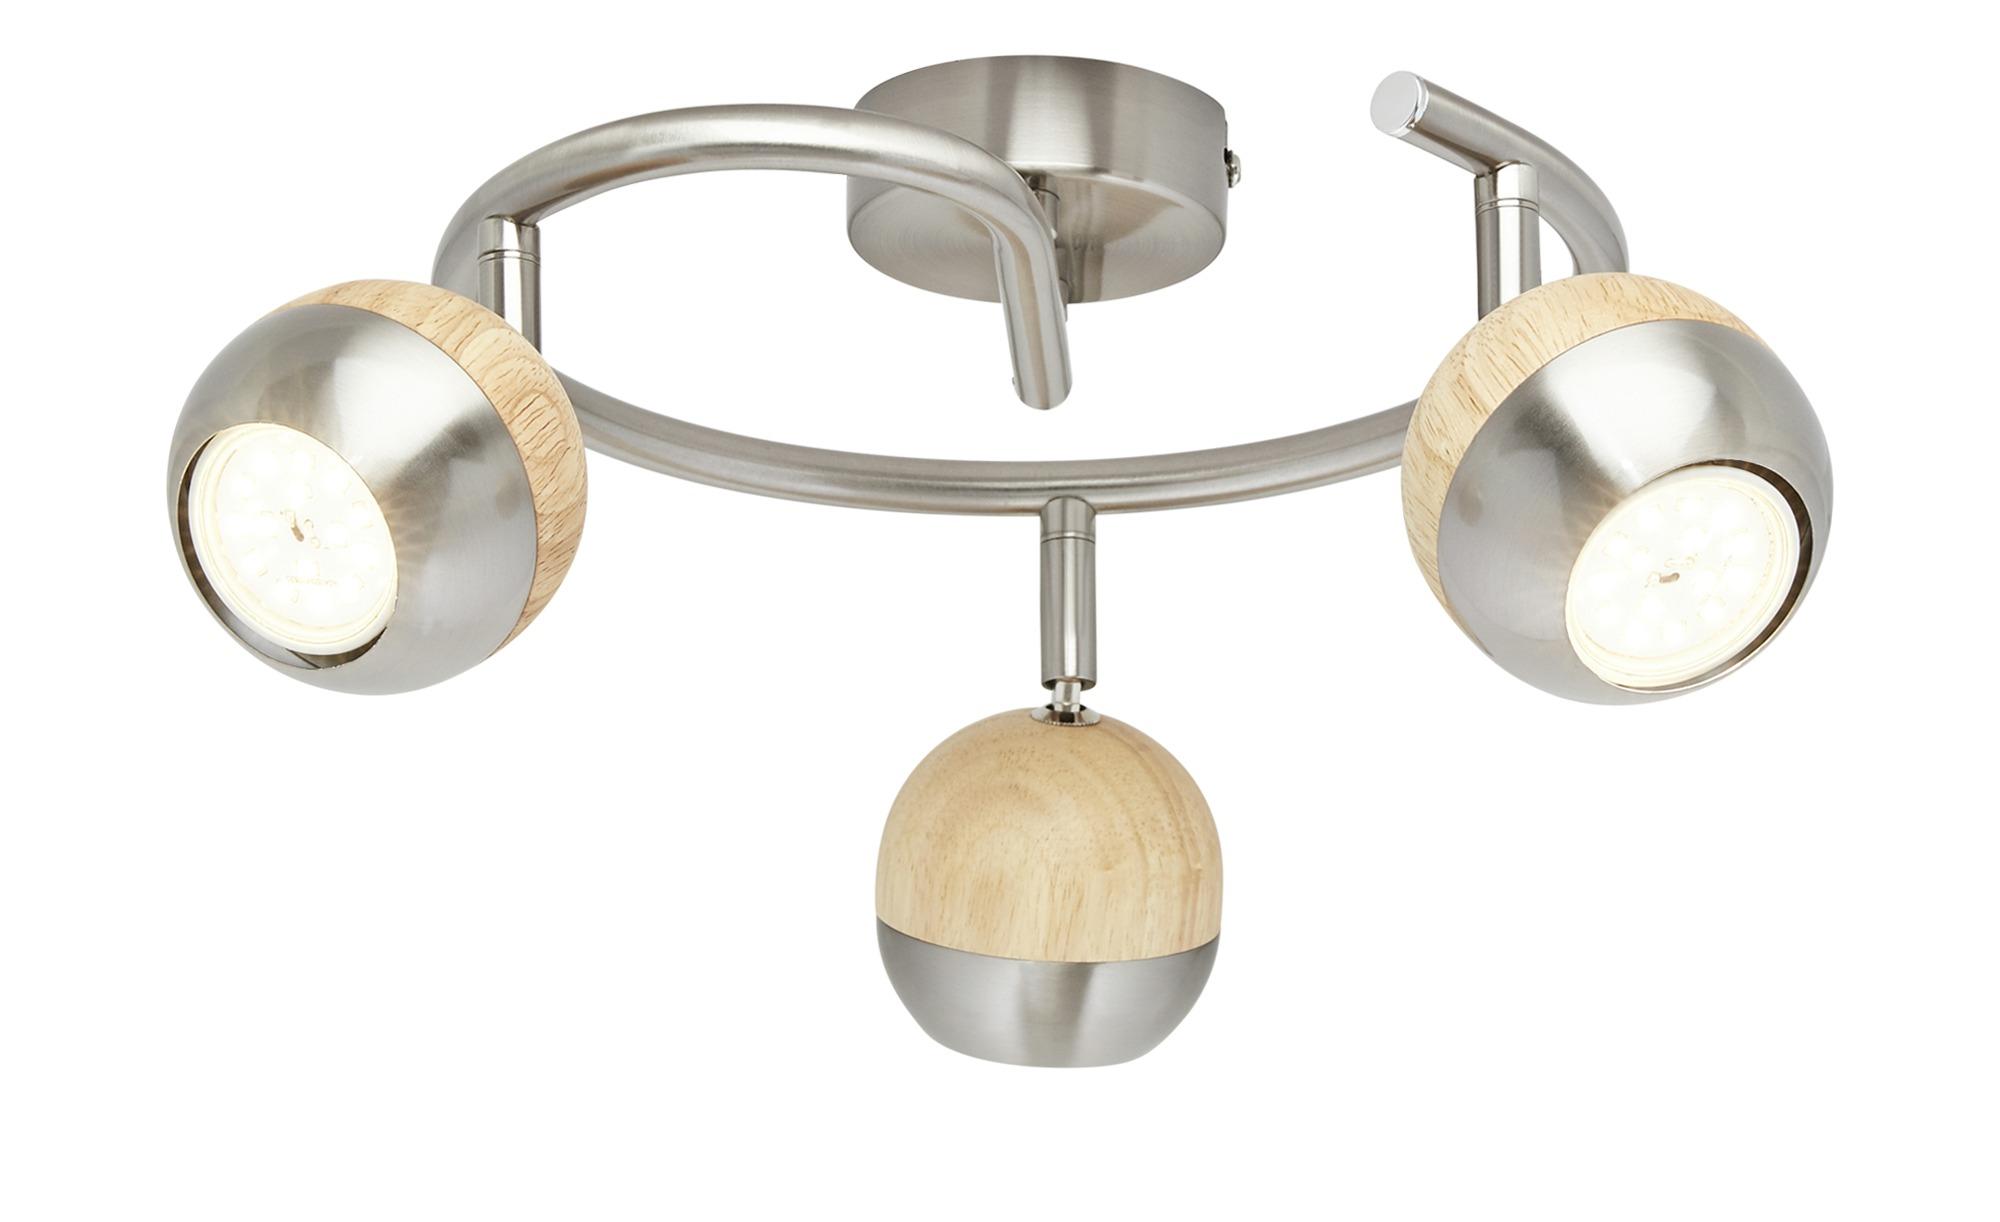 KHG LED-Spot, 3-flammig mit Holz ¦ braun ¦ Maße (cm): B: 8 H: 14 Ø: [25.0] Lampen & Leuchten > LED-Leuchten > LED-Strahler & Spots - Höffner